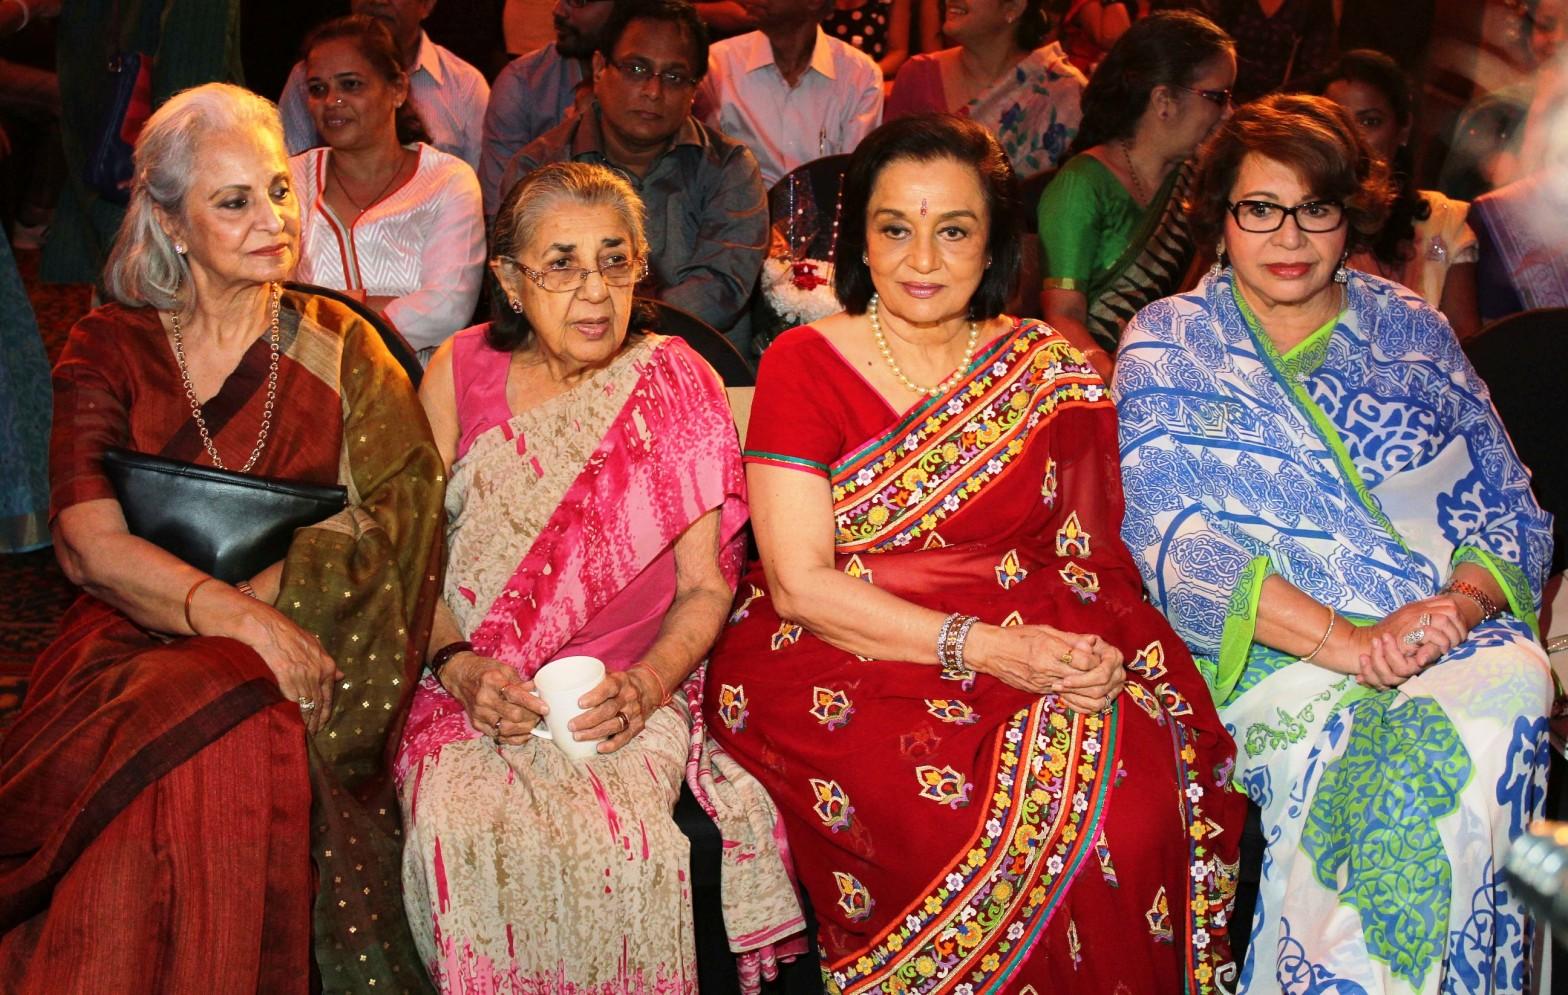 Waheeda Rehman, Shammi ji, Asha Parekh and Helen at Asha Parekh's hand impression tile launch for UTV STARS WALK OF THE STARS